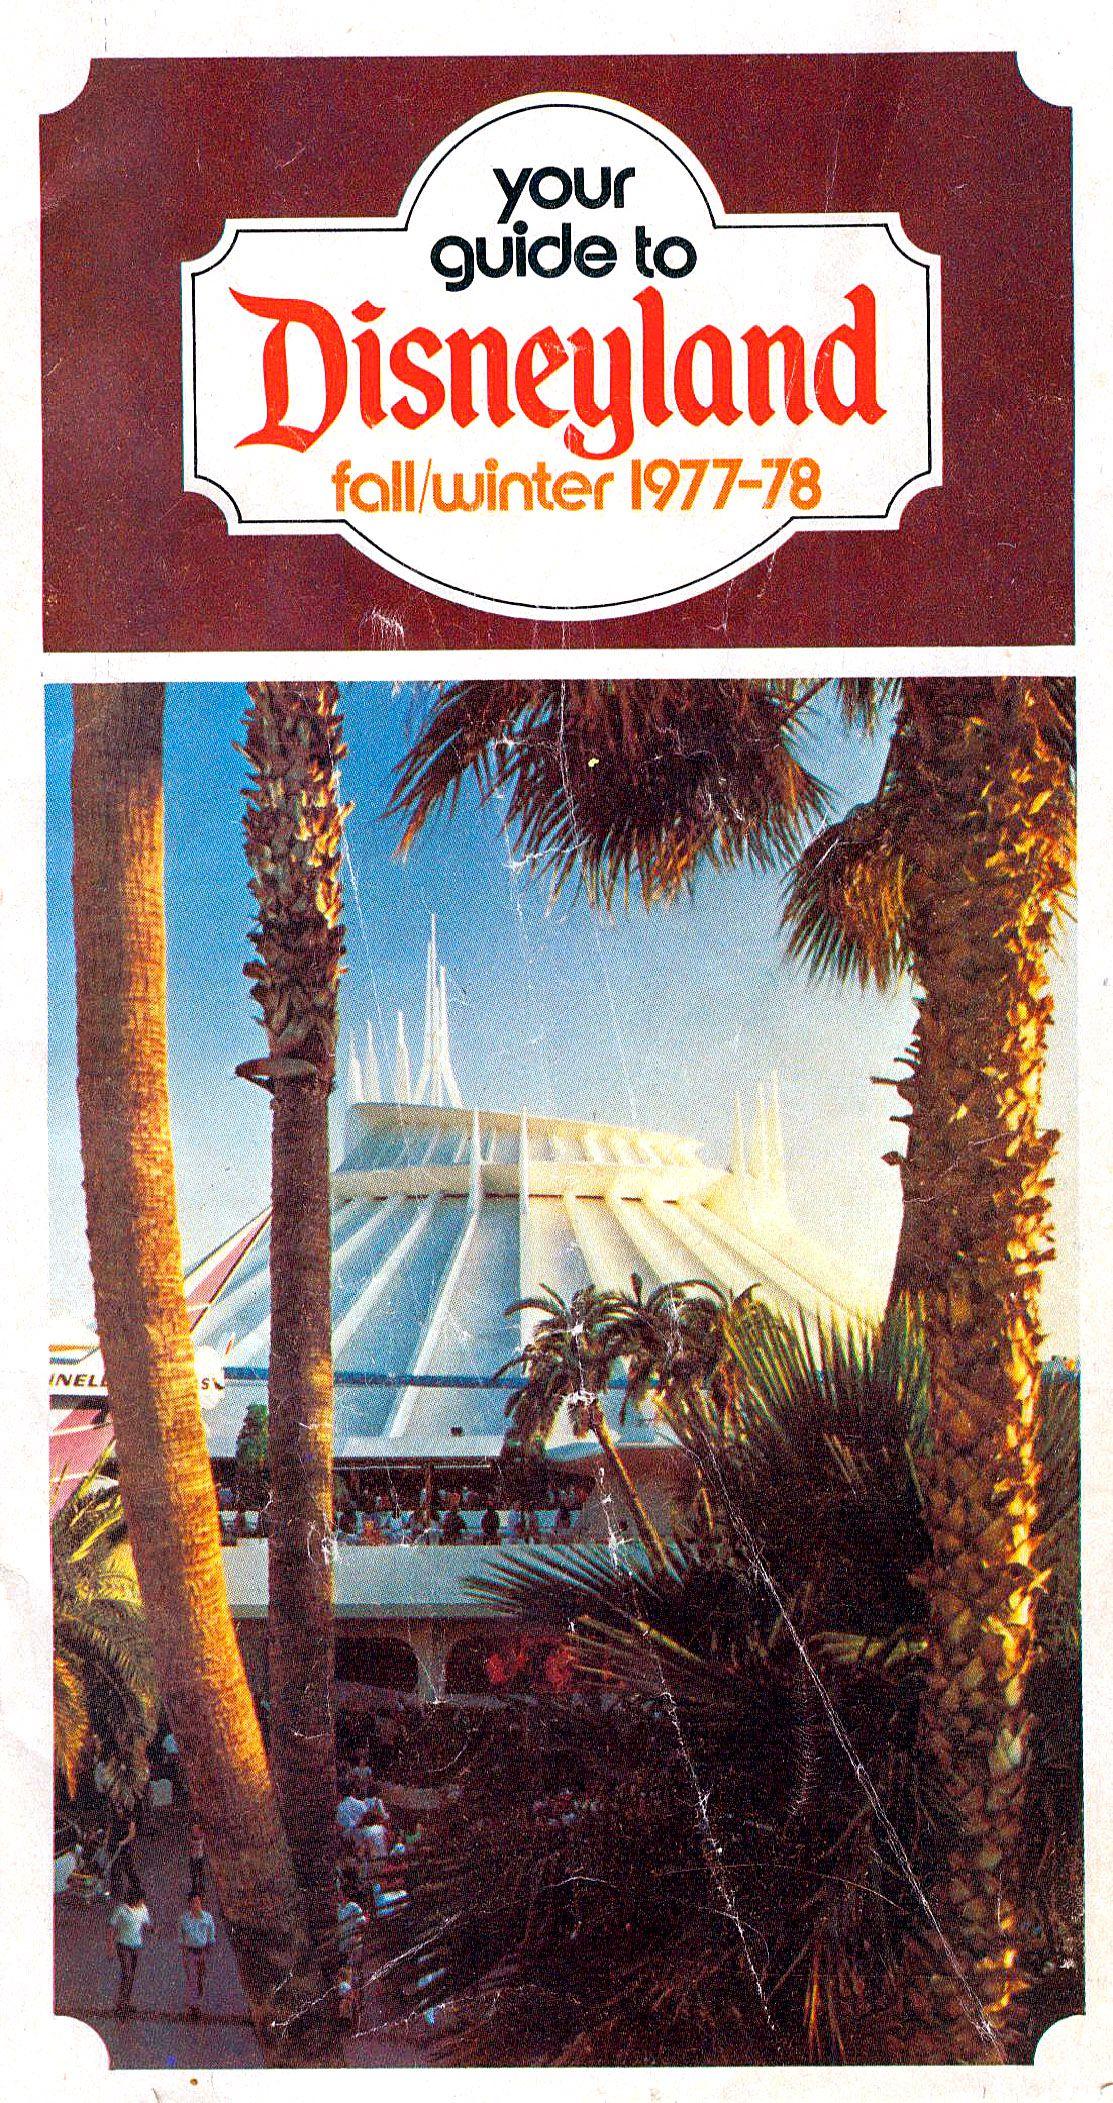 Old Disneyland brochure